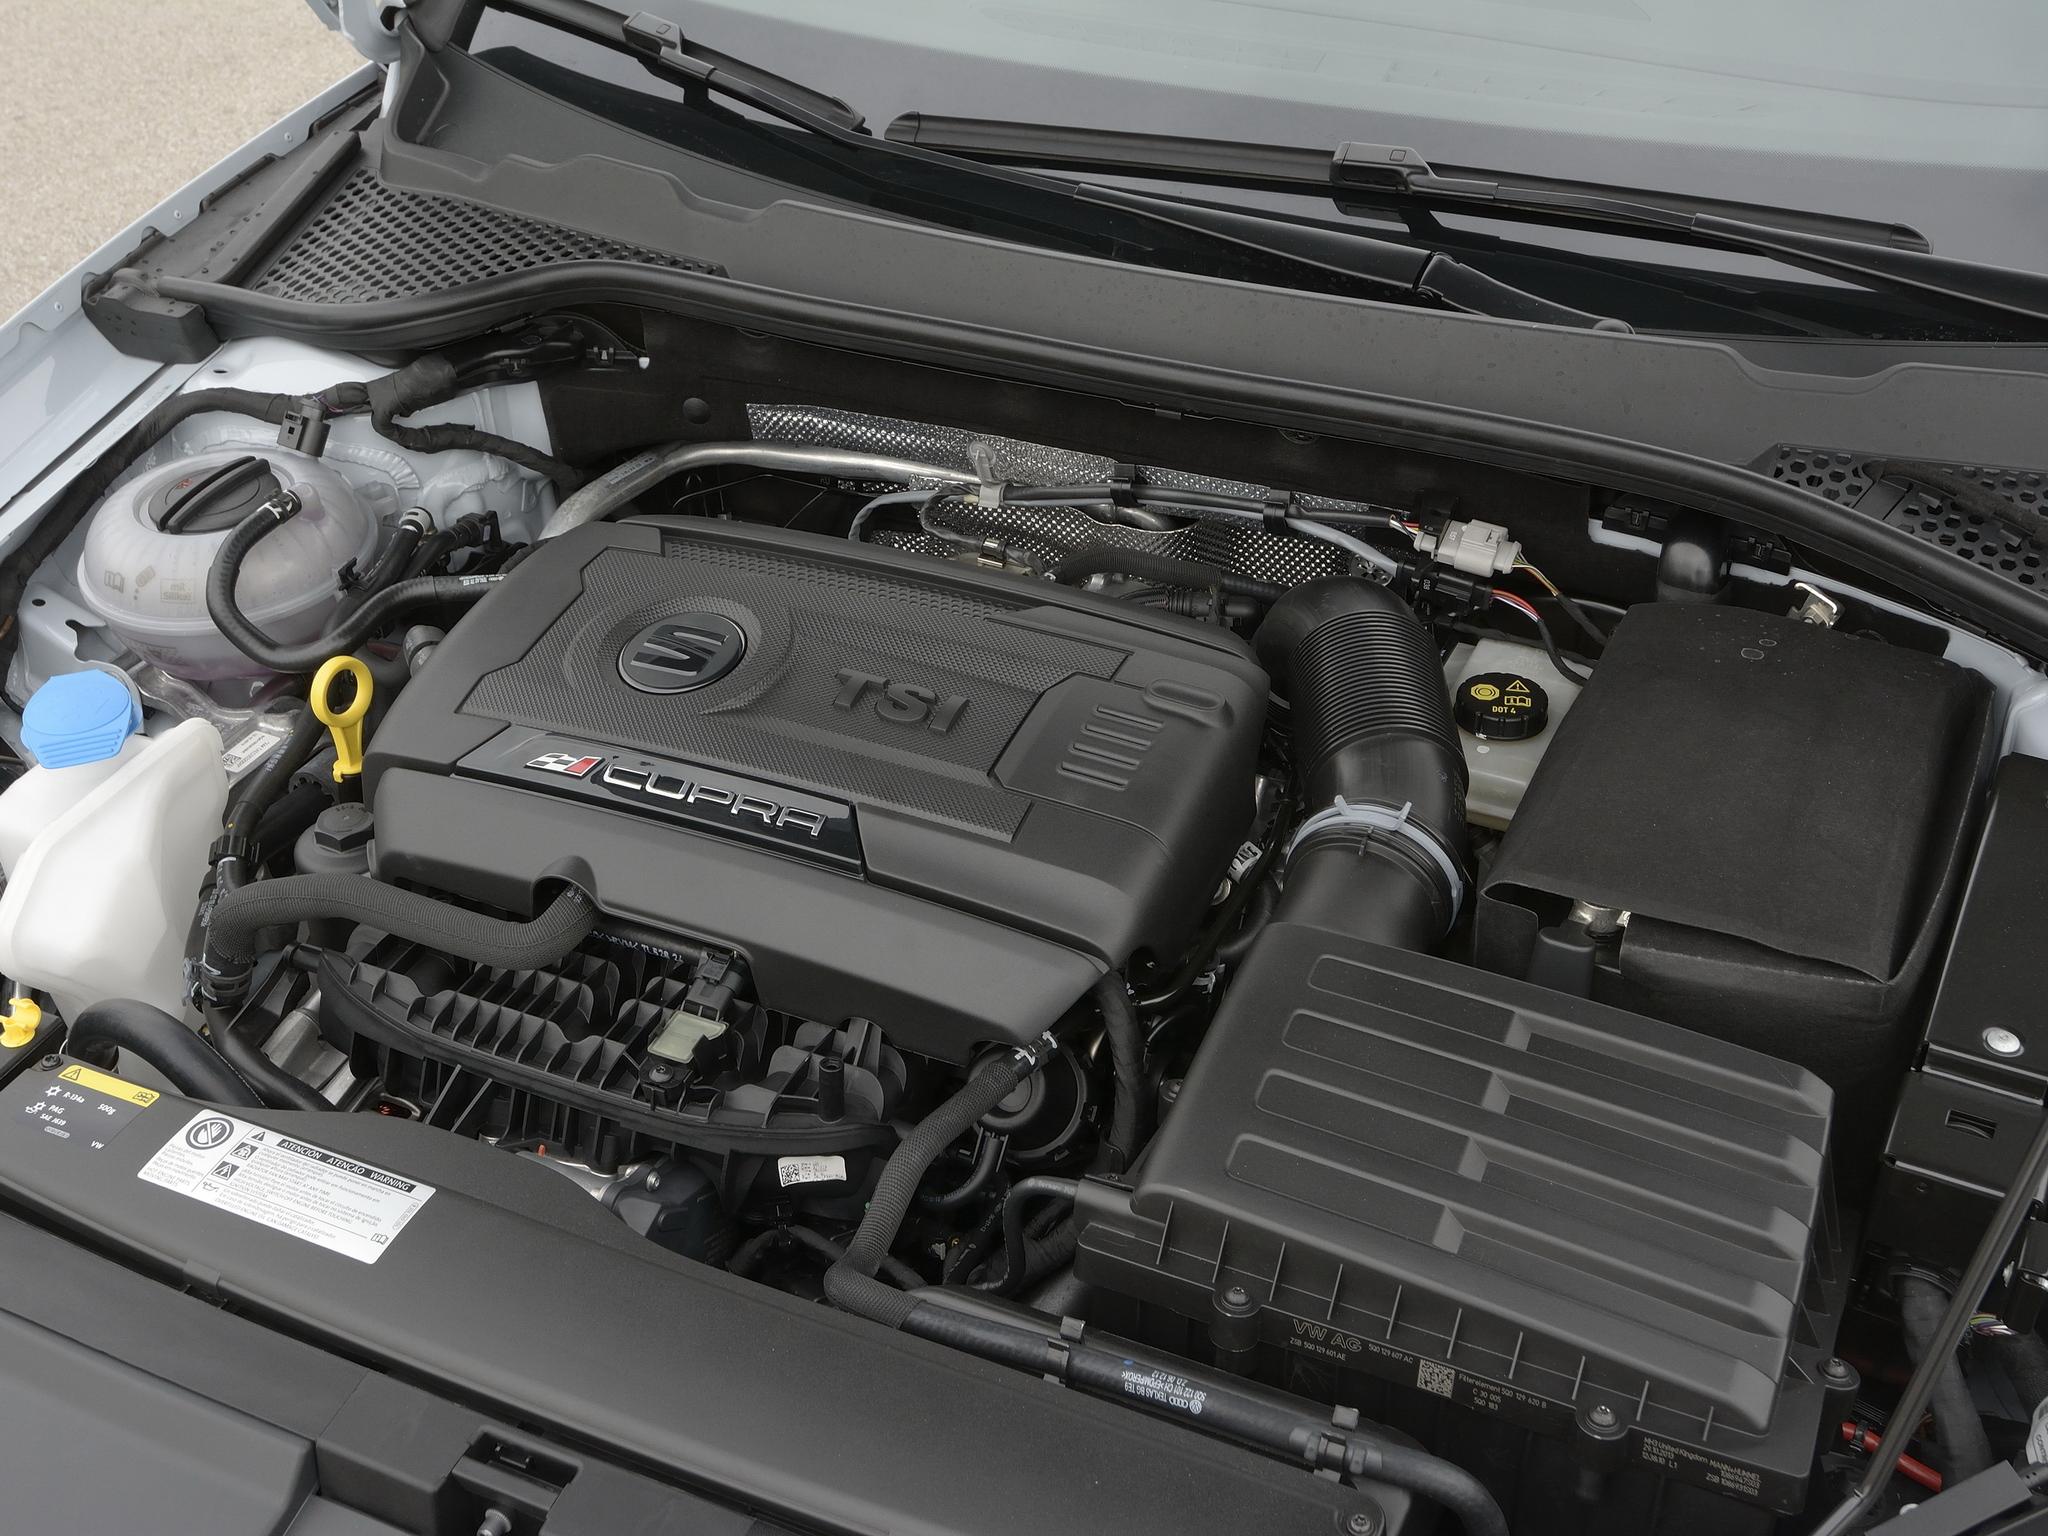 2014 Audi S3, Golf R and Leon Cupra Developing Turbo